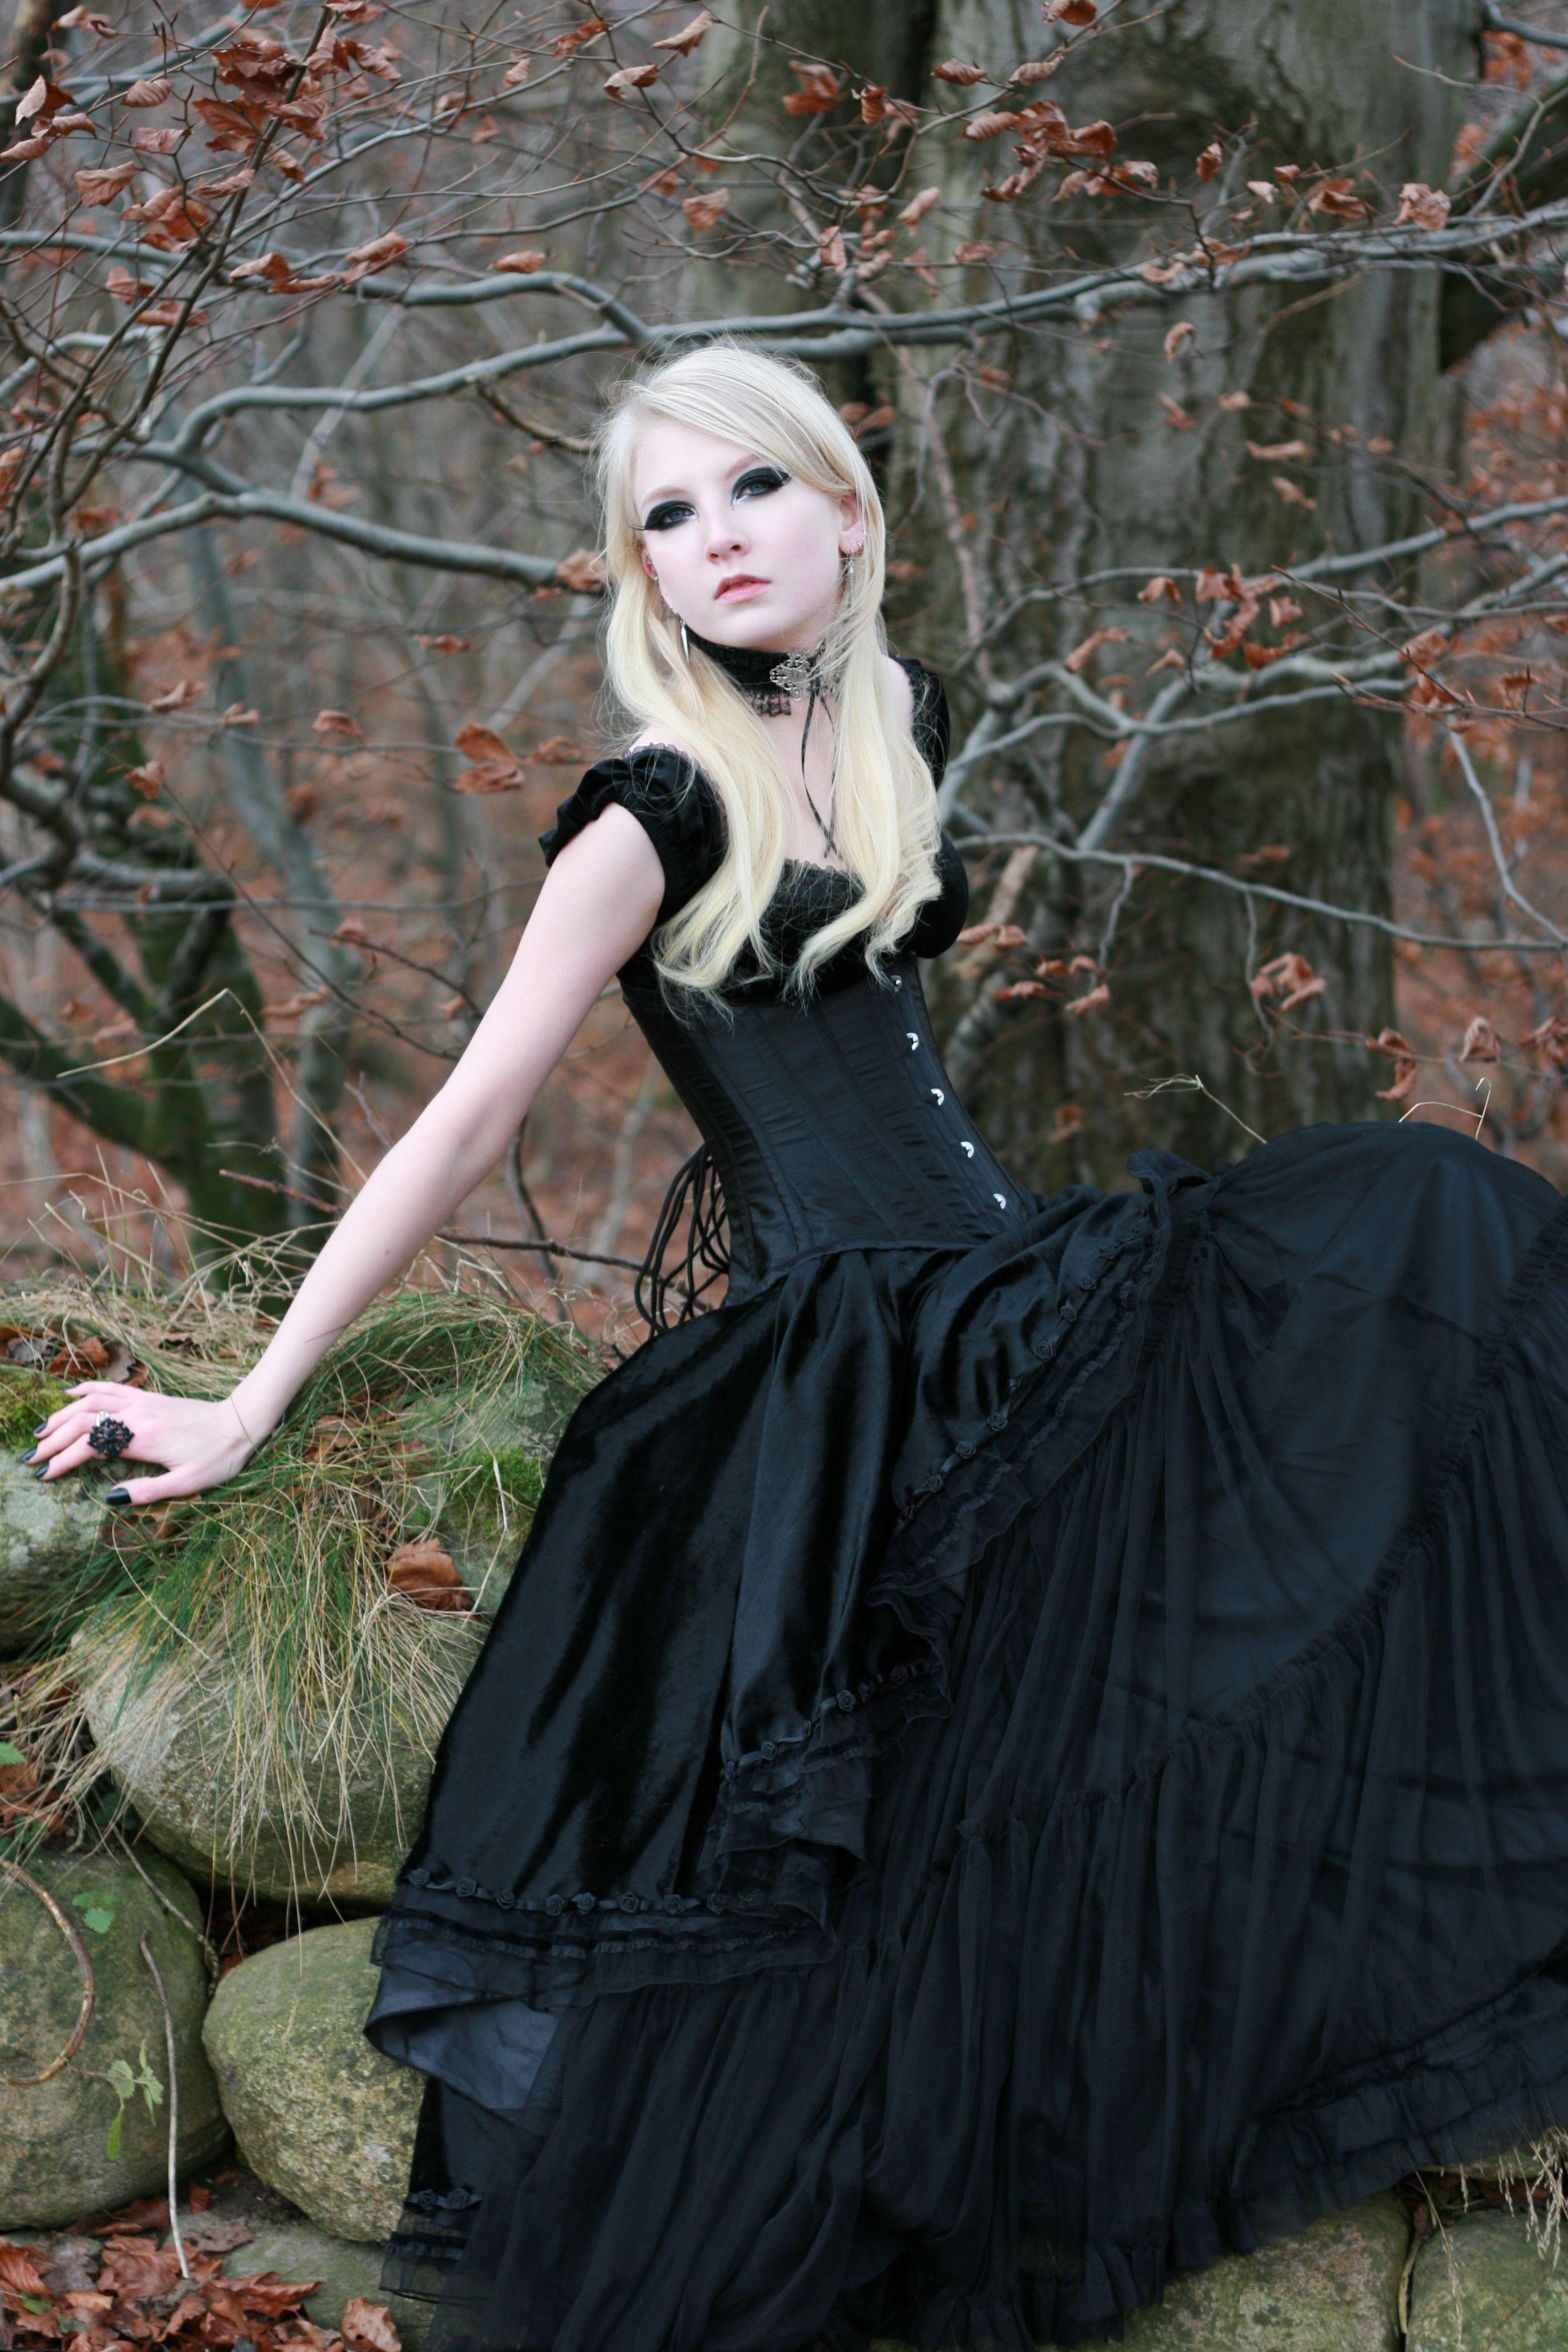 Gothic Gown Maria Amanda deviantart.com |